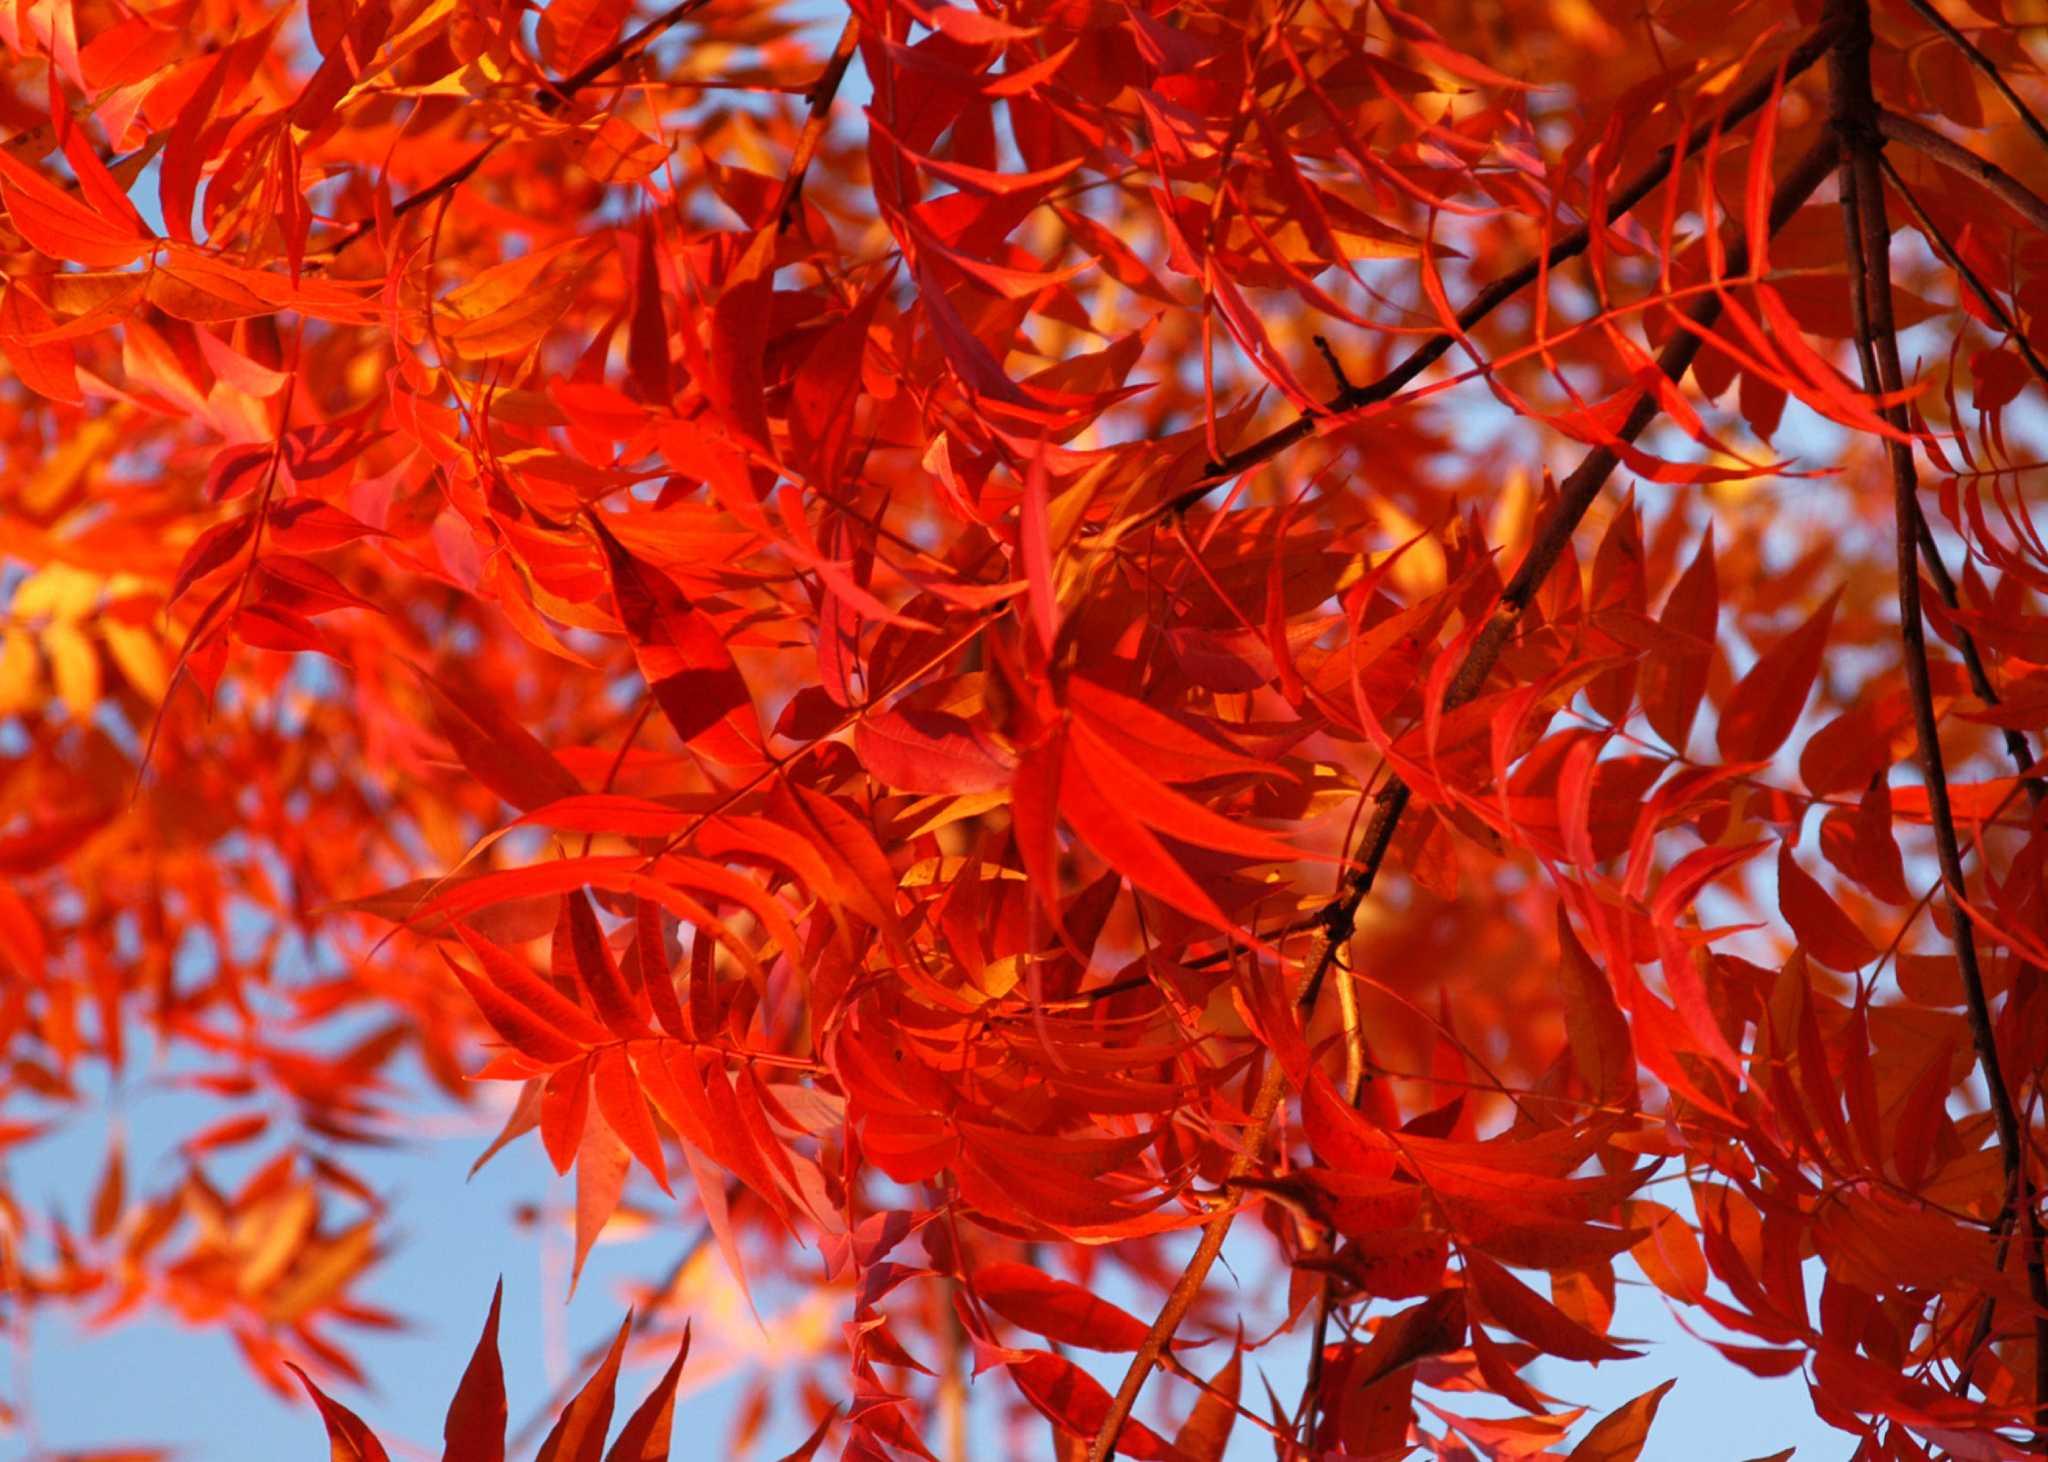 Neil Sperry Chinese Pistachio Fall Foliage Invasive